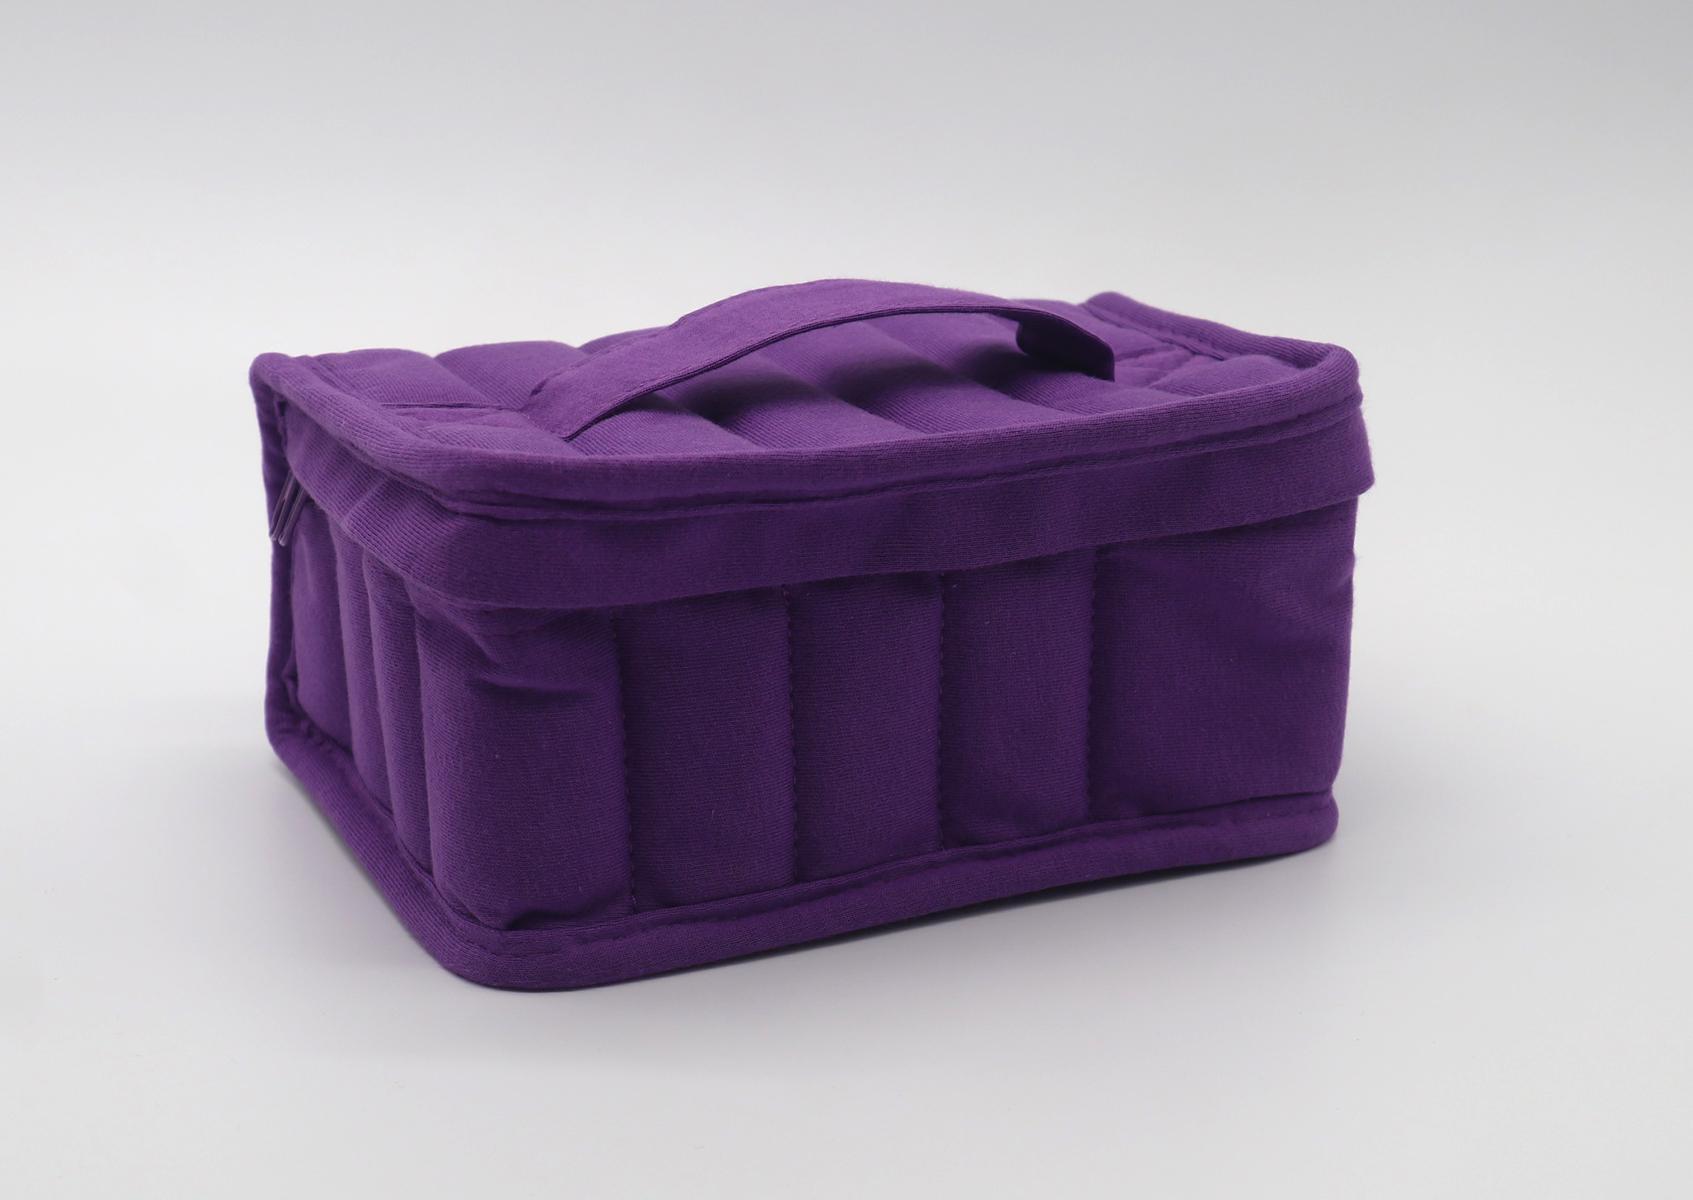 Thirteen bottles holders mutispandex made essential oil pouch bag  4